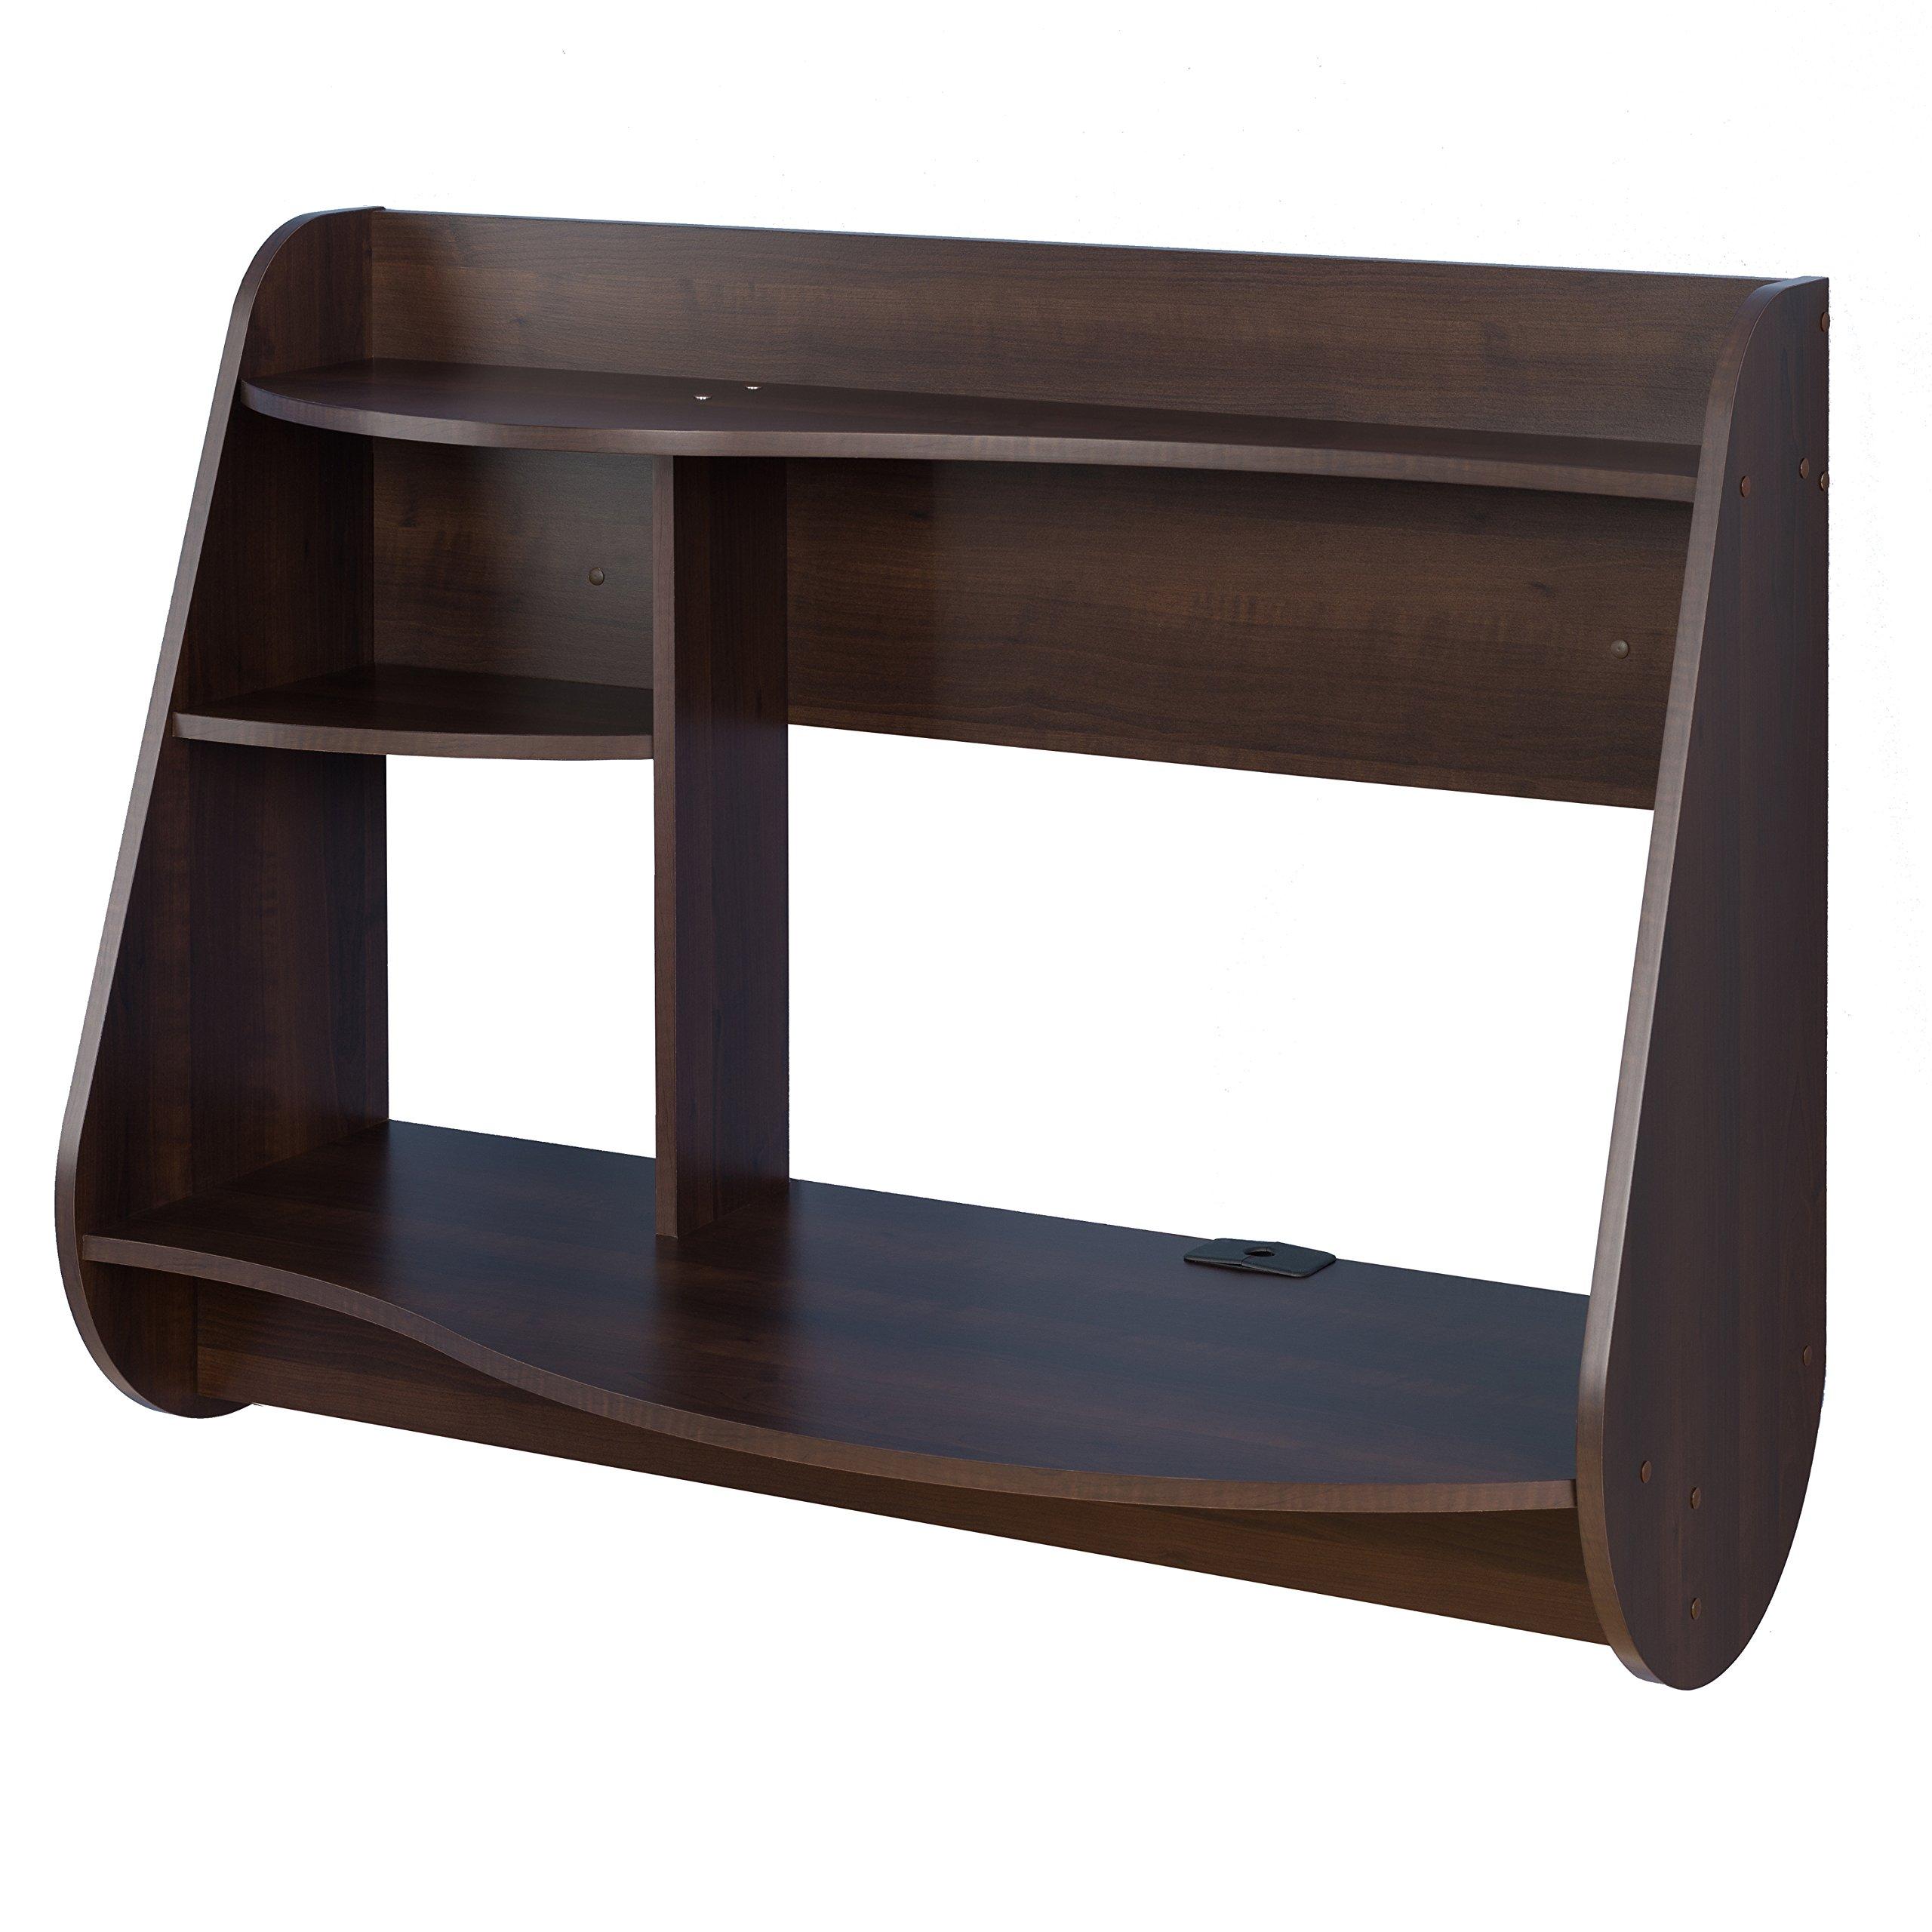 Prepac Kurv Floating Desk, Espresso